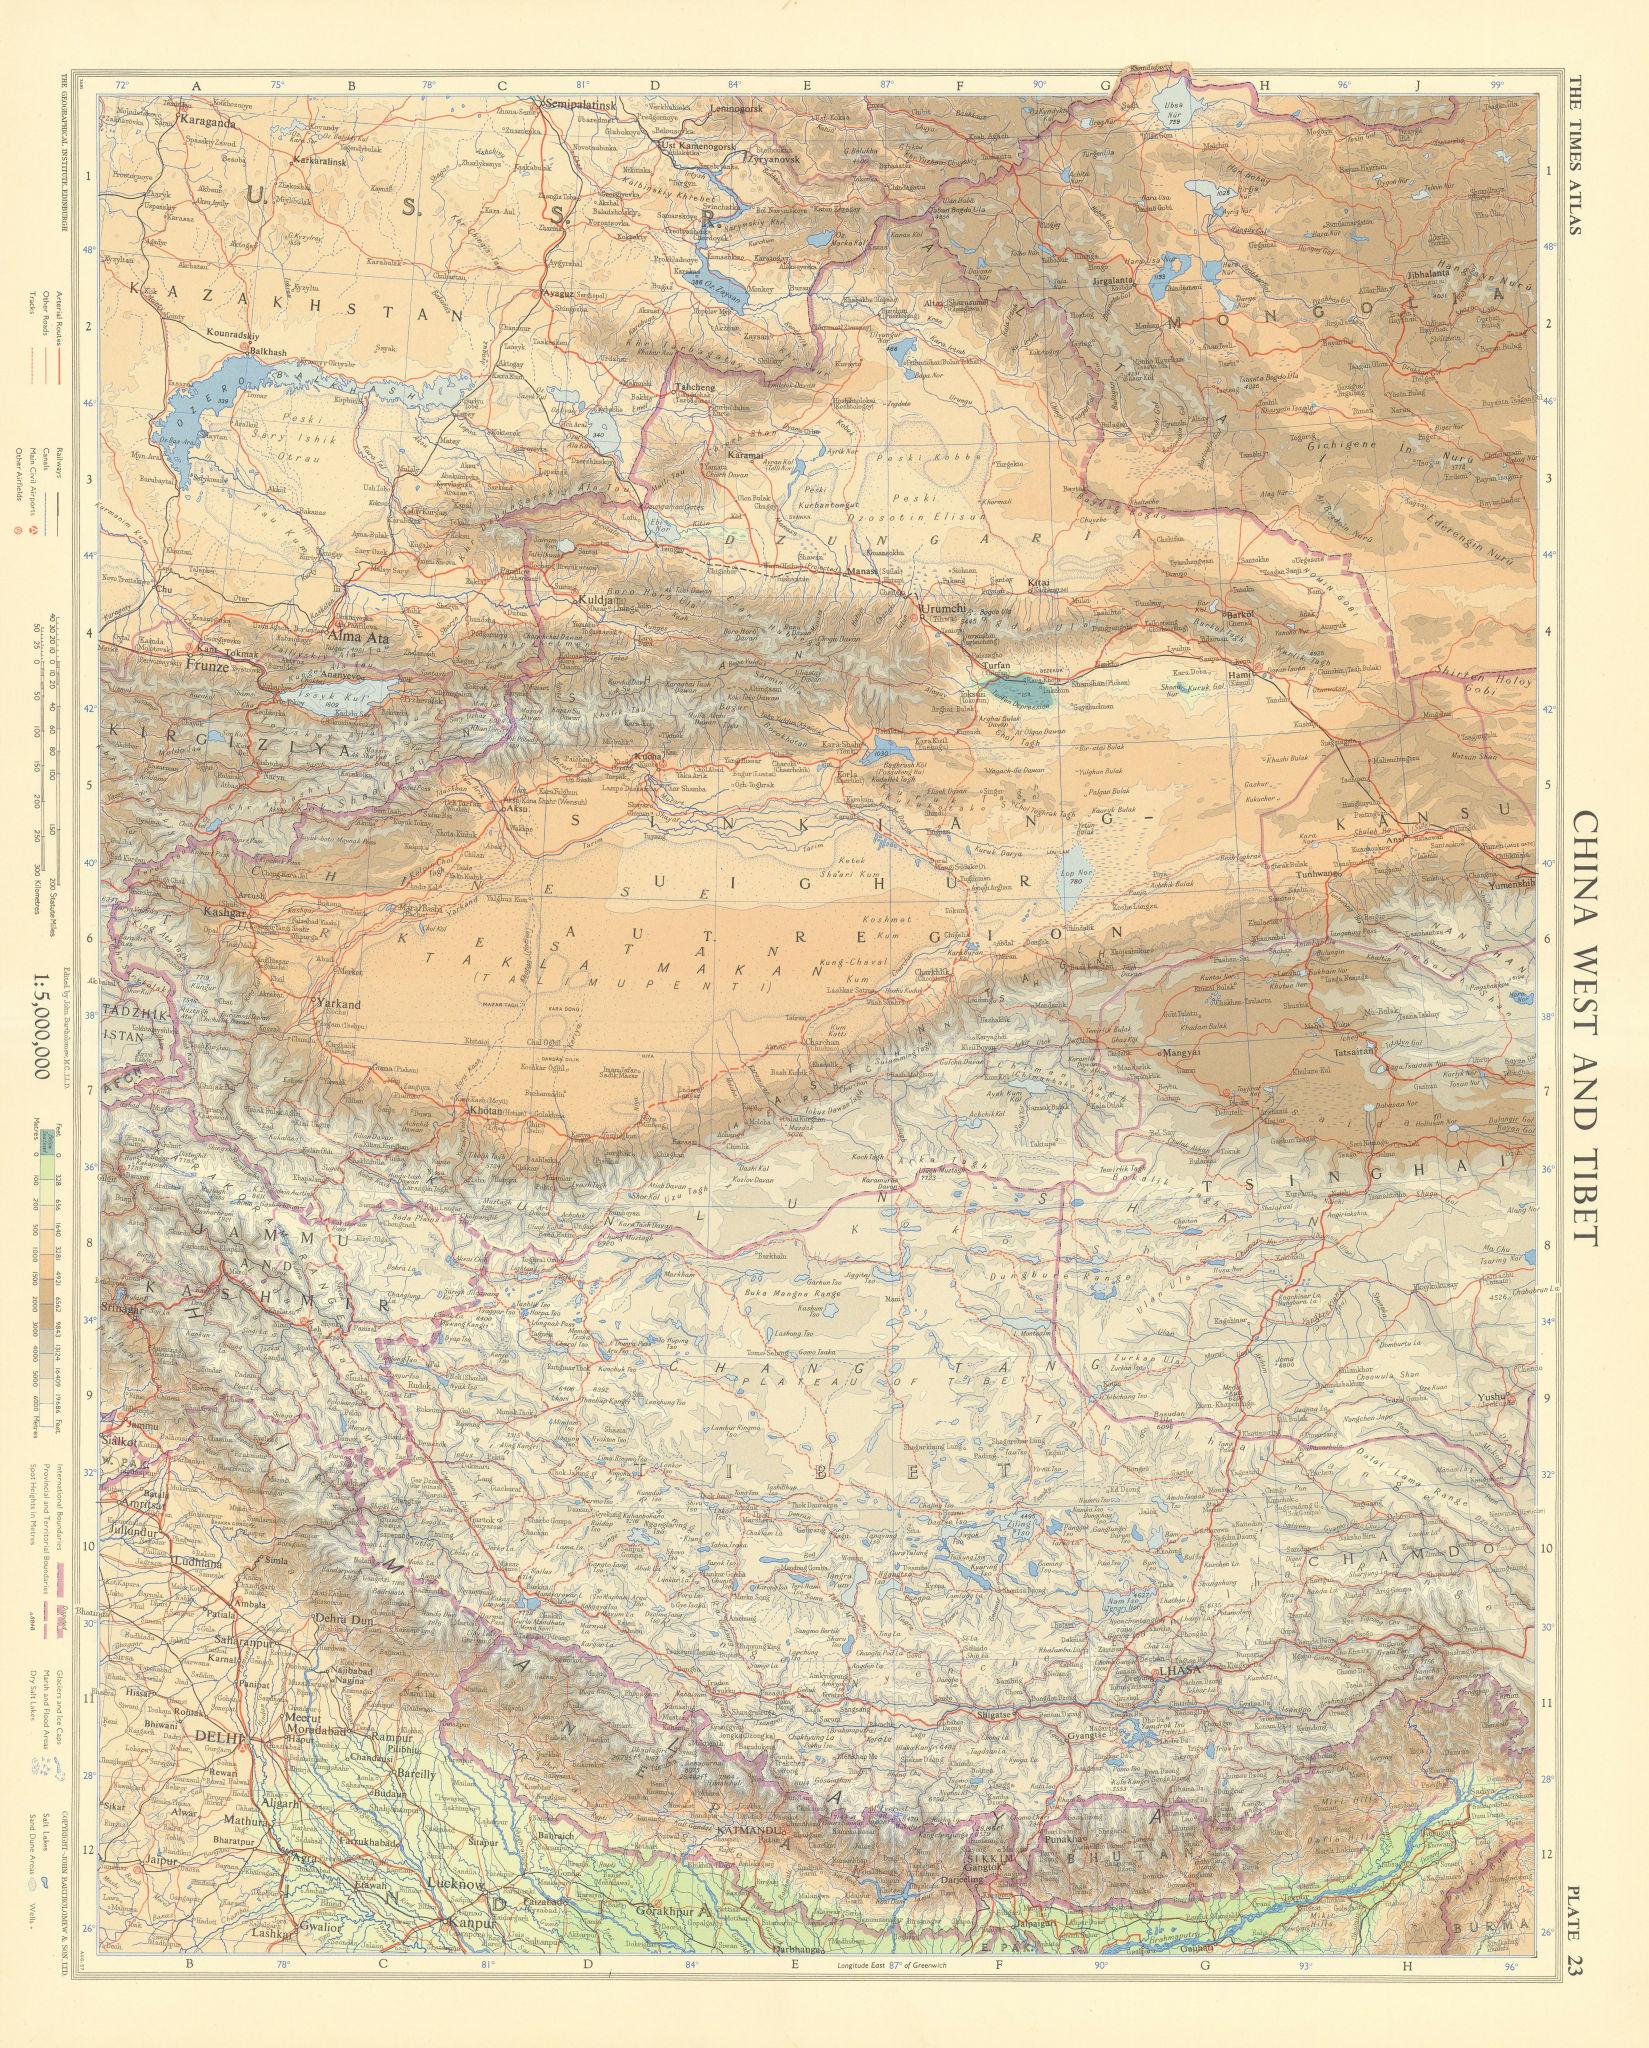 Western China & Tibet. Himalayas. Nepal & Bhutan. TIMES 1958 old vintage map